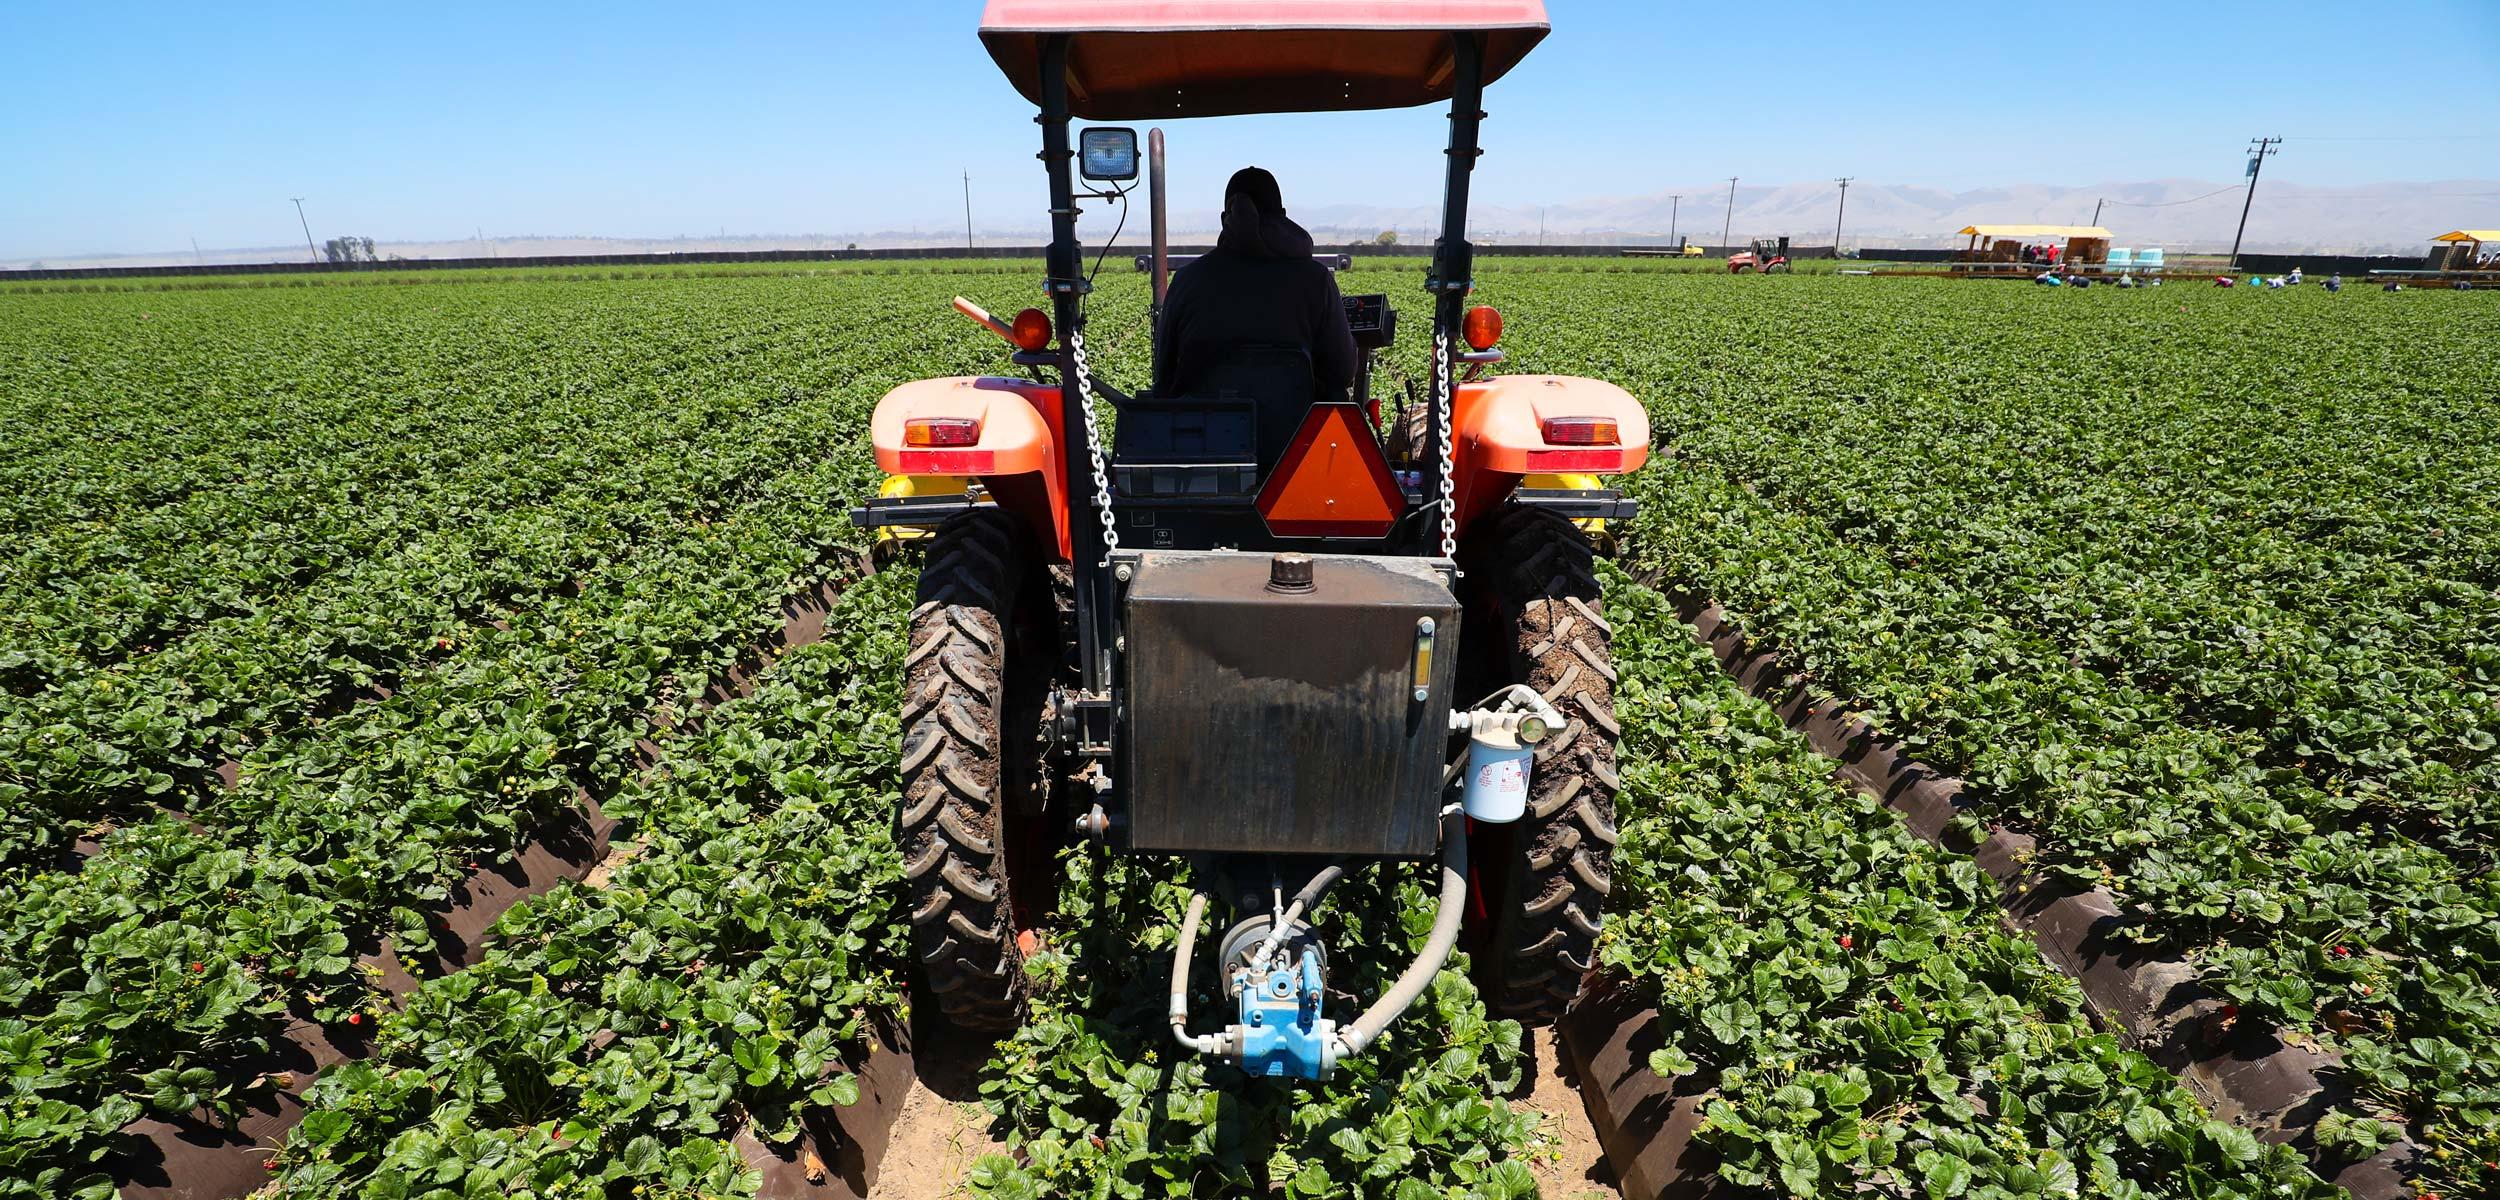 Main-Street-Produce-Farm-Tractor-Field